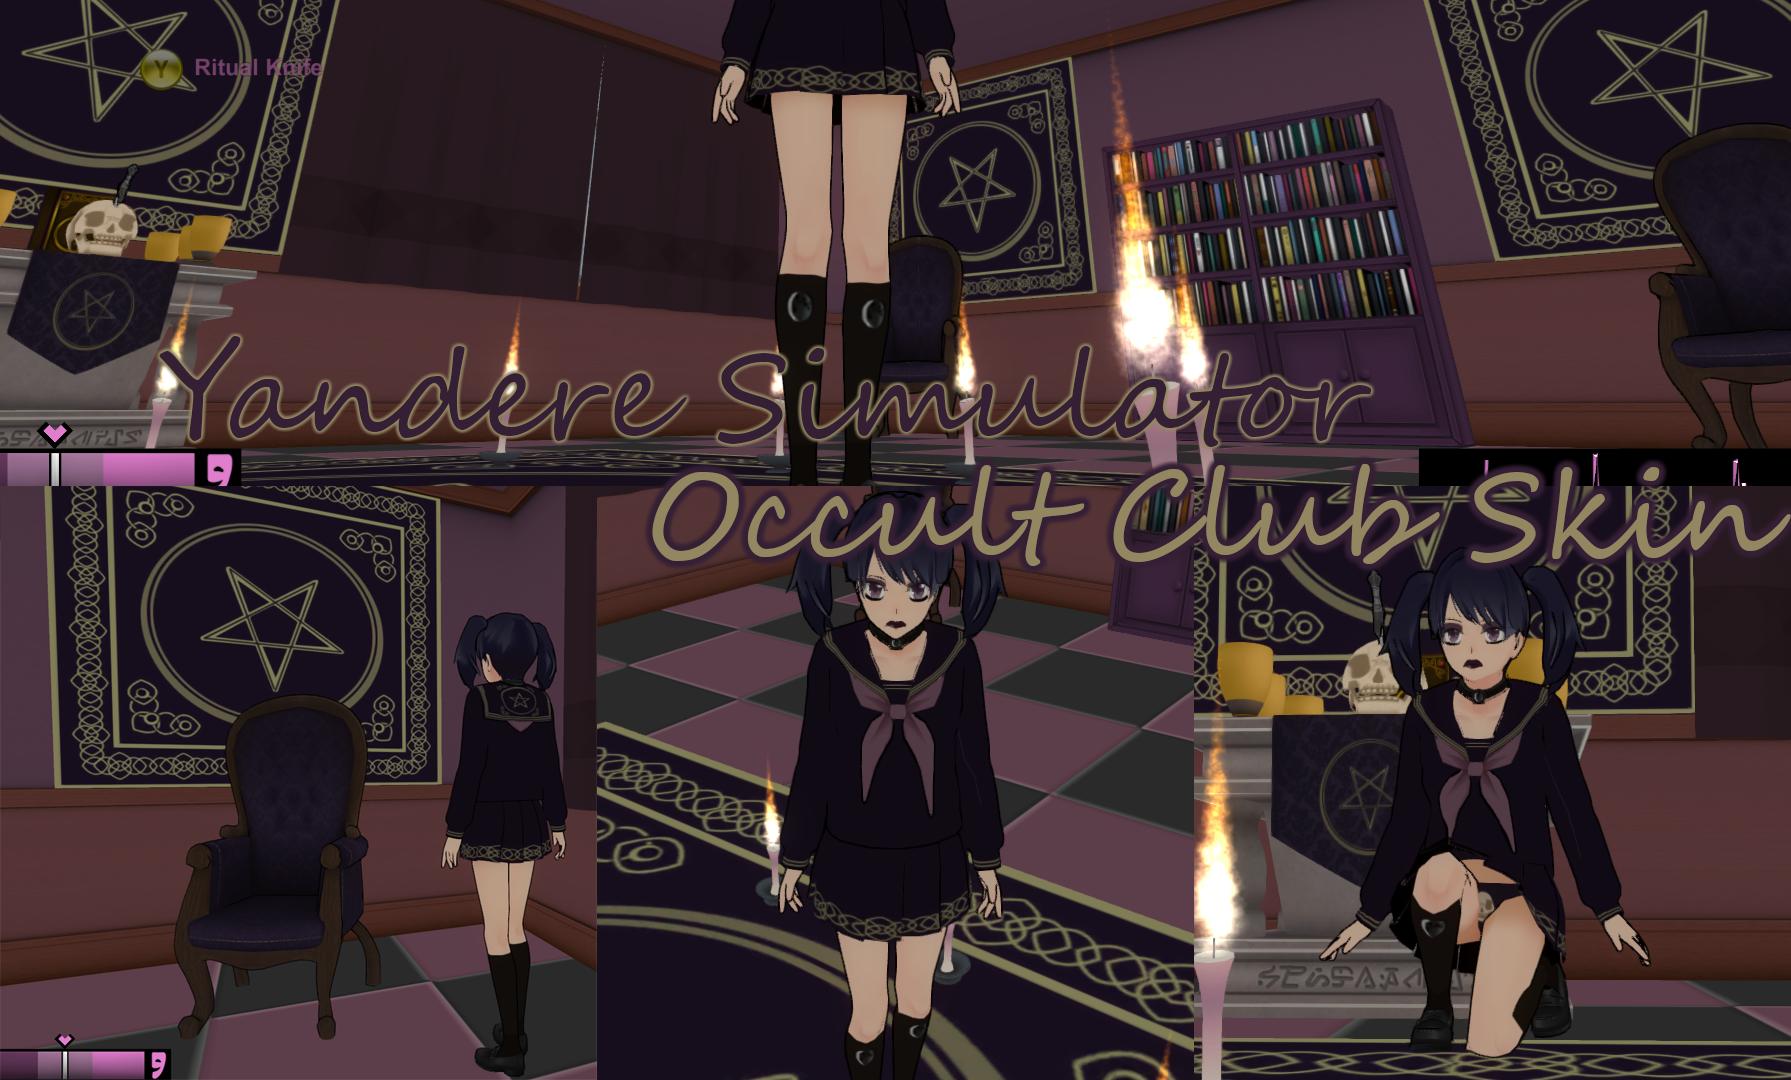 yandere simulator occult club skin by xx hime sama xx on deviantart. Black Bedroom Furniture Sets. Home Design Ideas